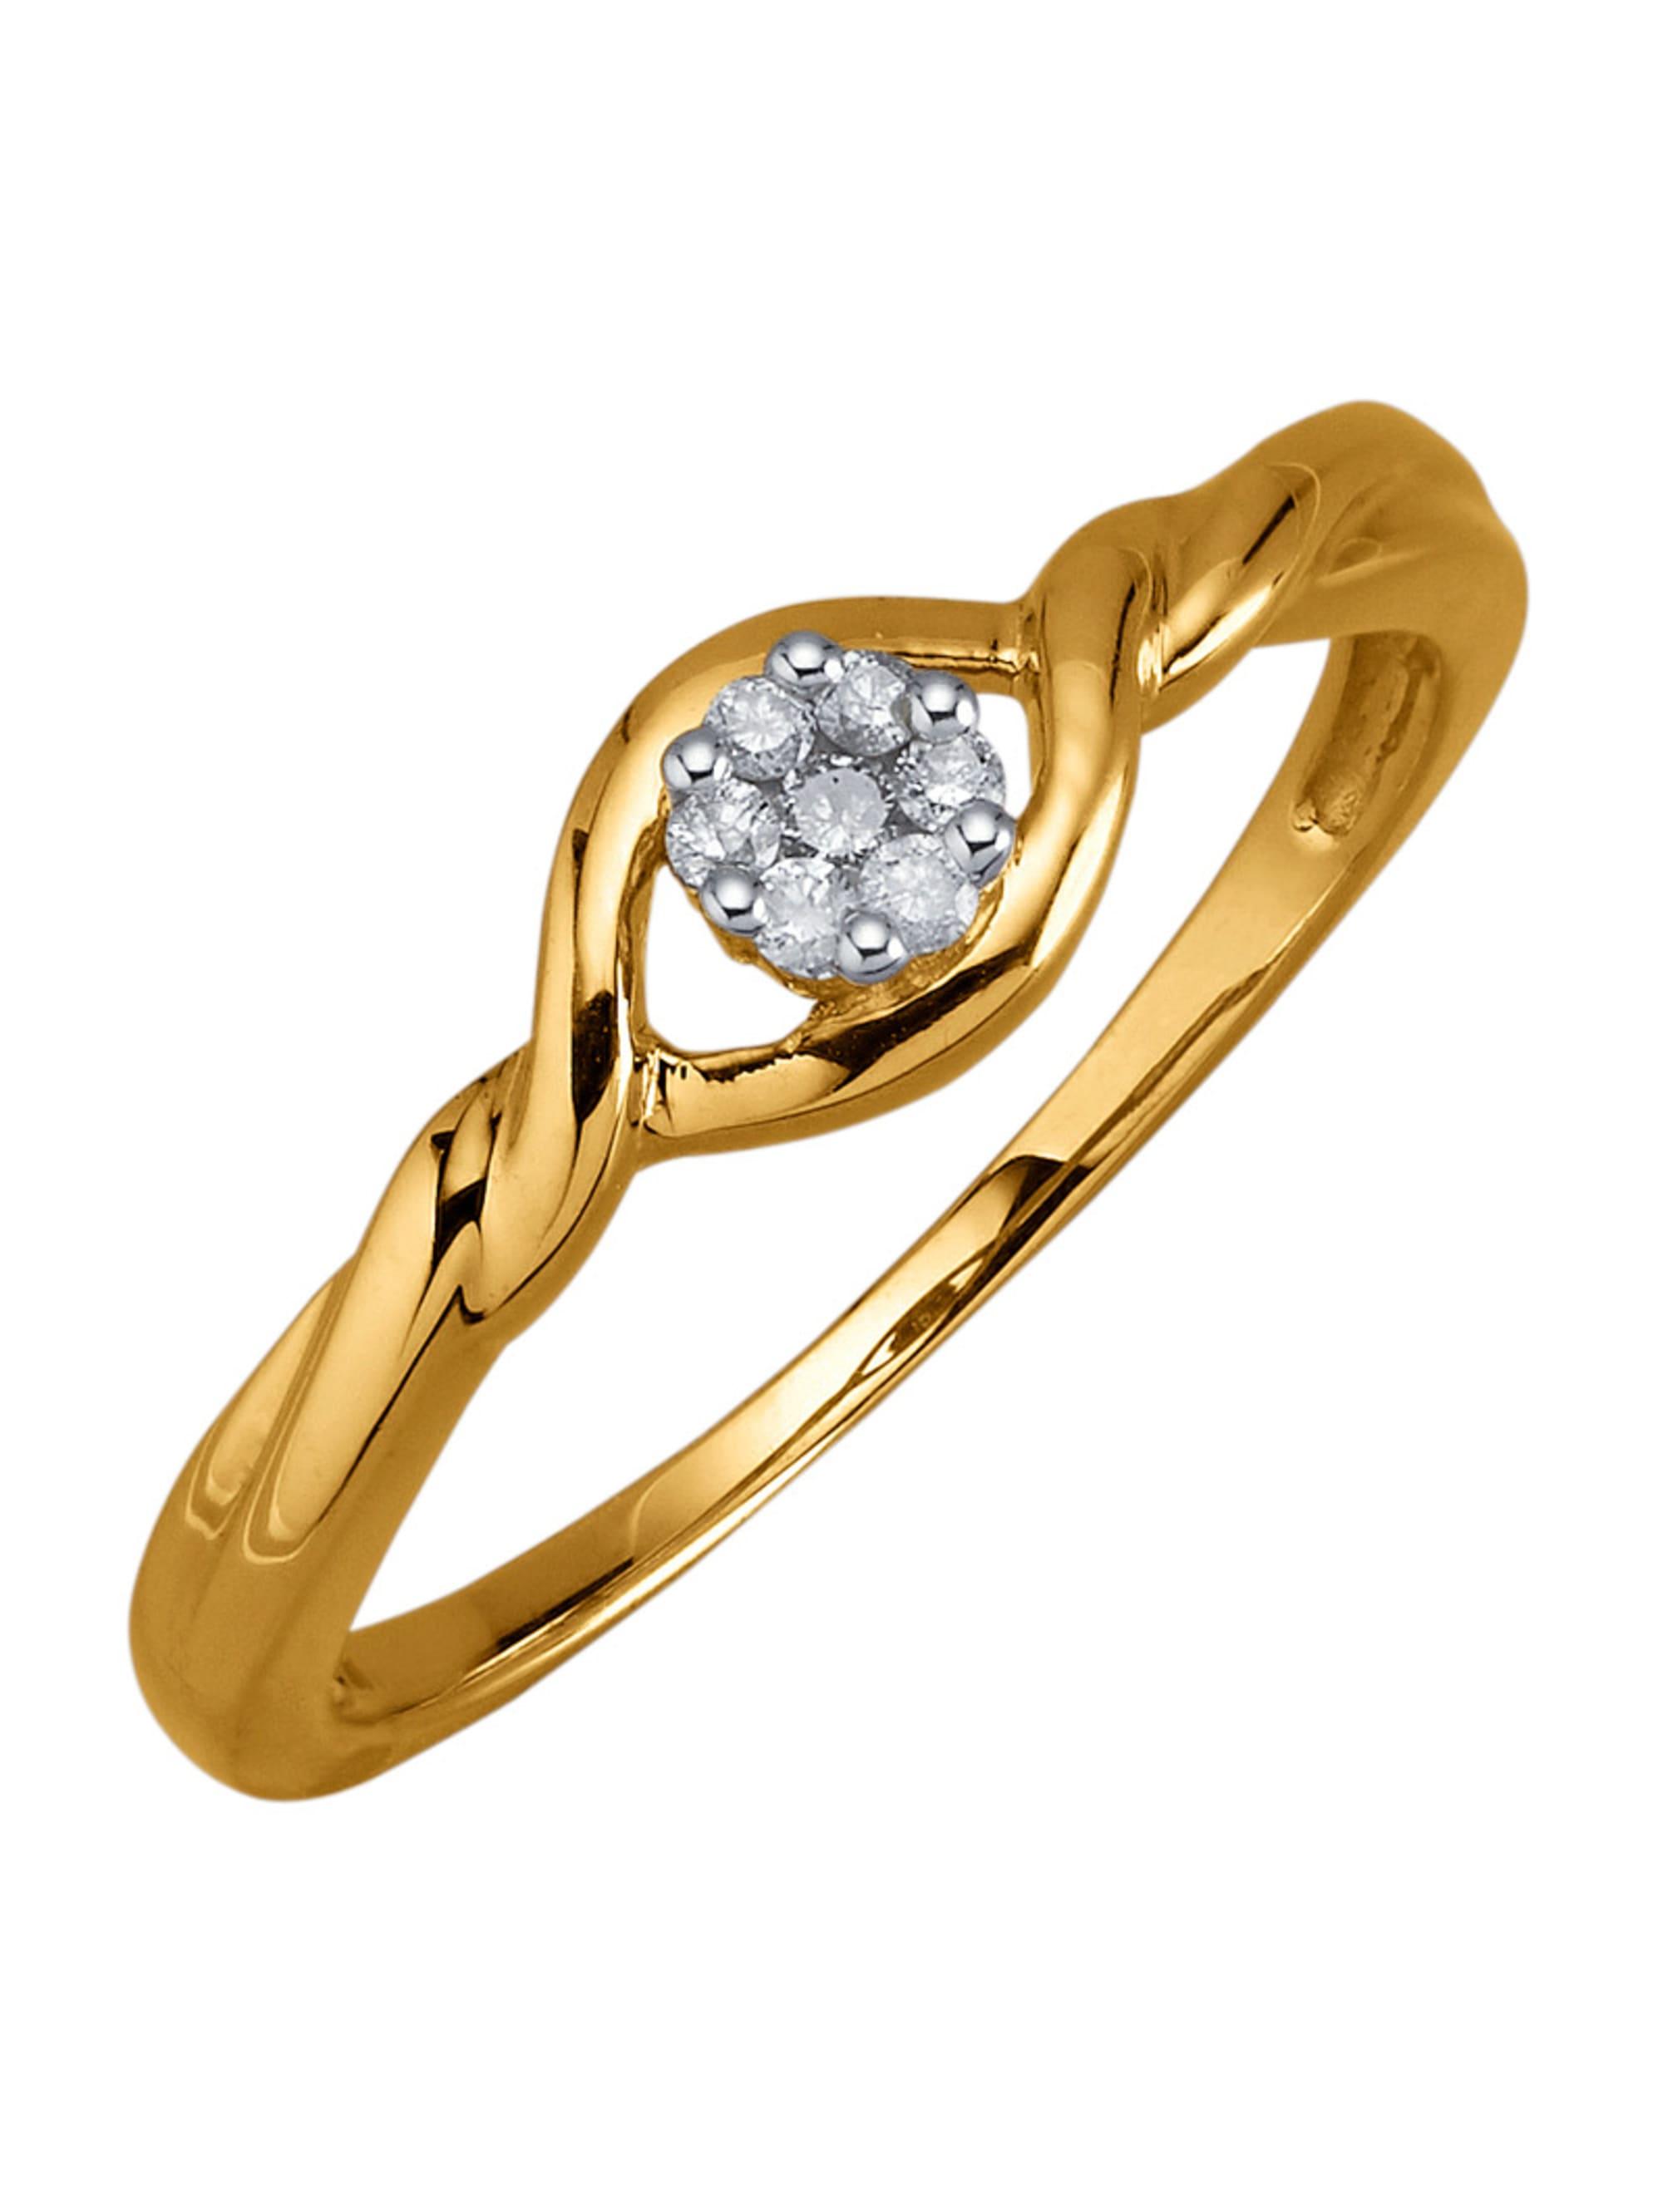 Damenring mit Diamanten KhEPj